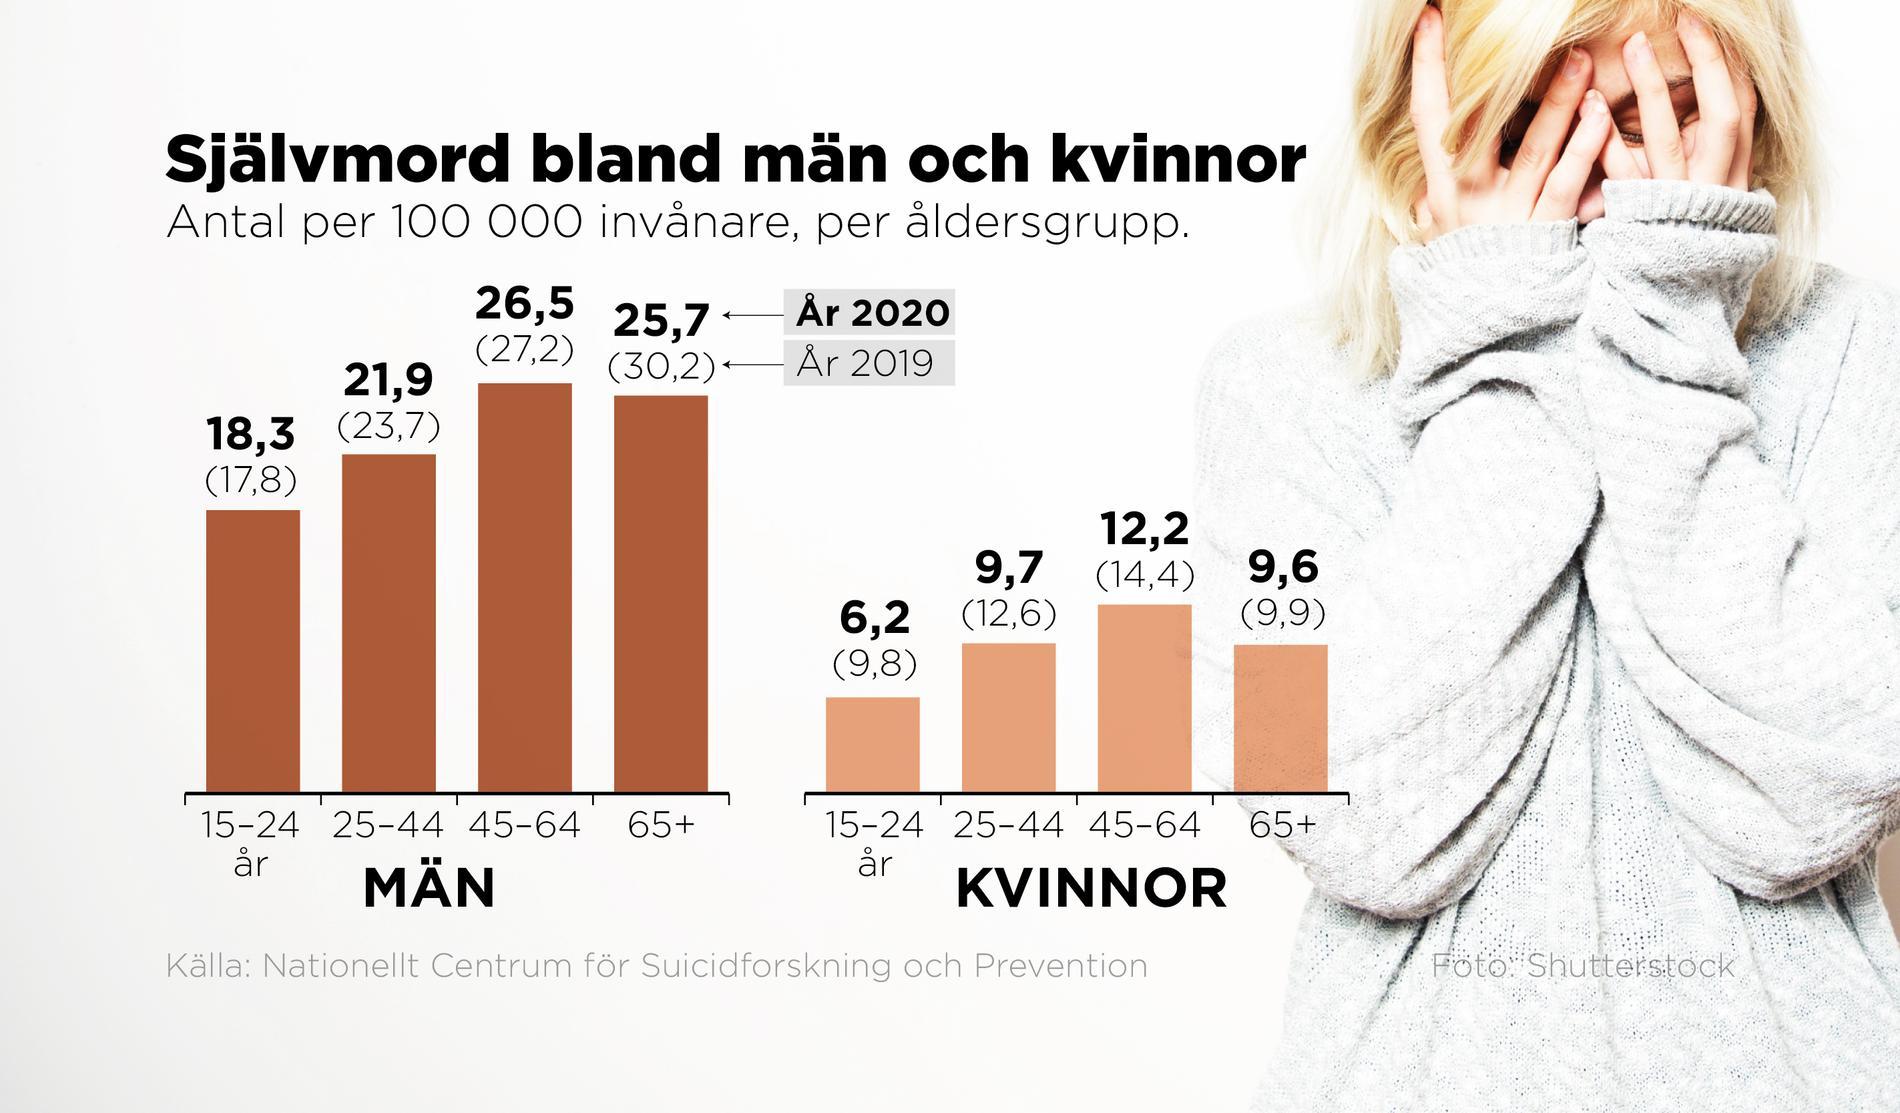 2020 tog 1168 personer i Sverige sitt liv. I ytterligare 273 fall fanns misstanke om suicid.